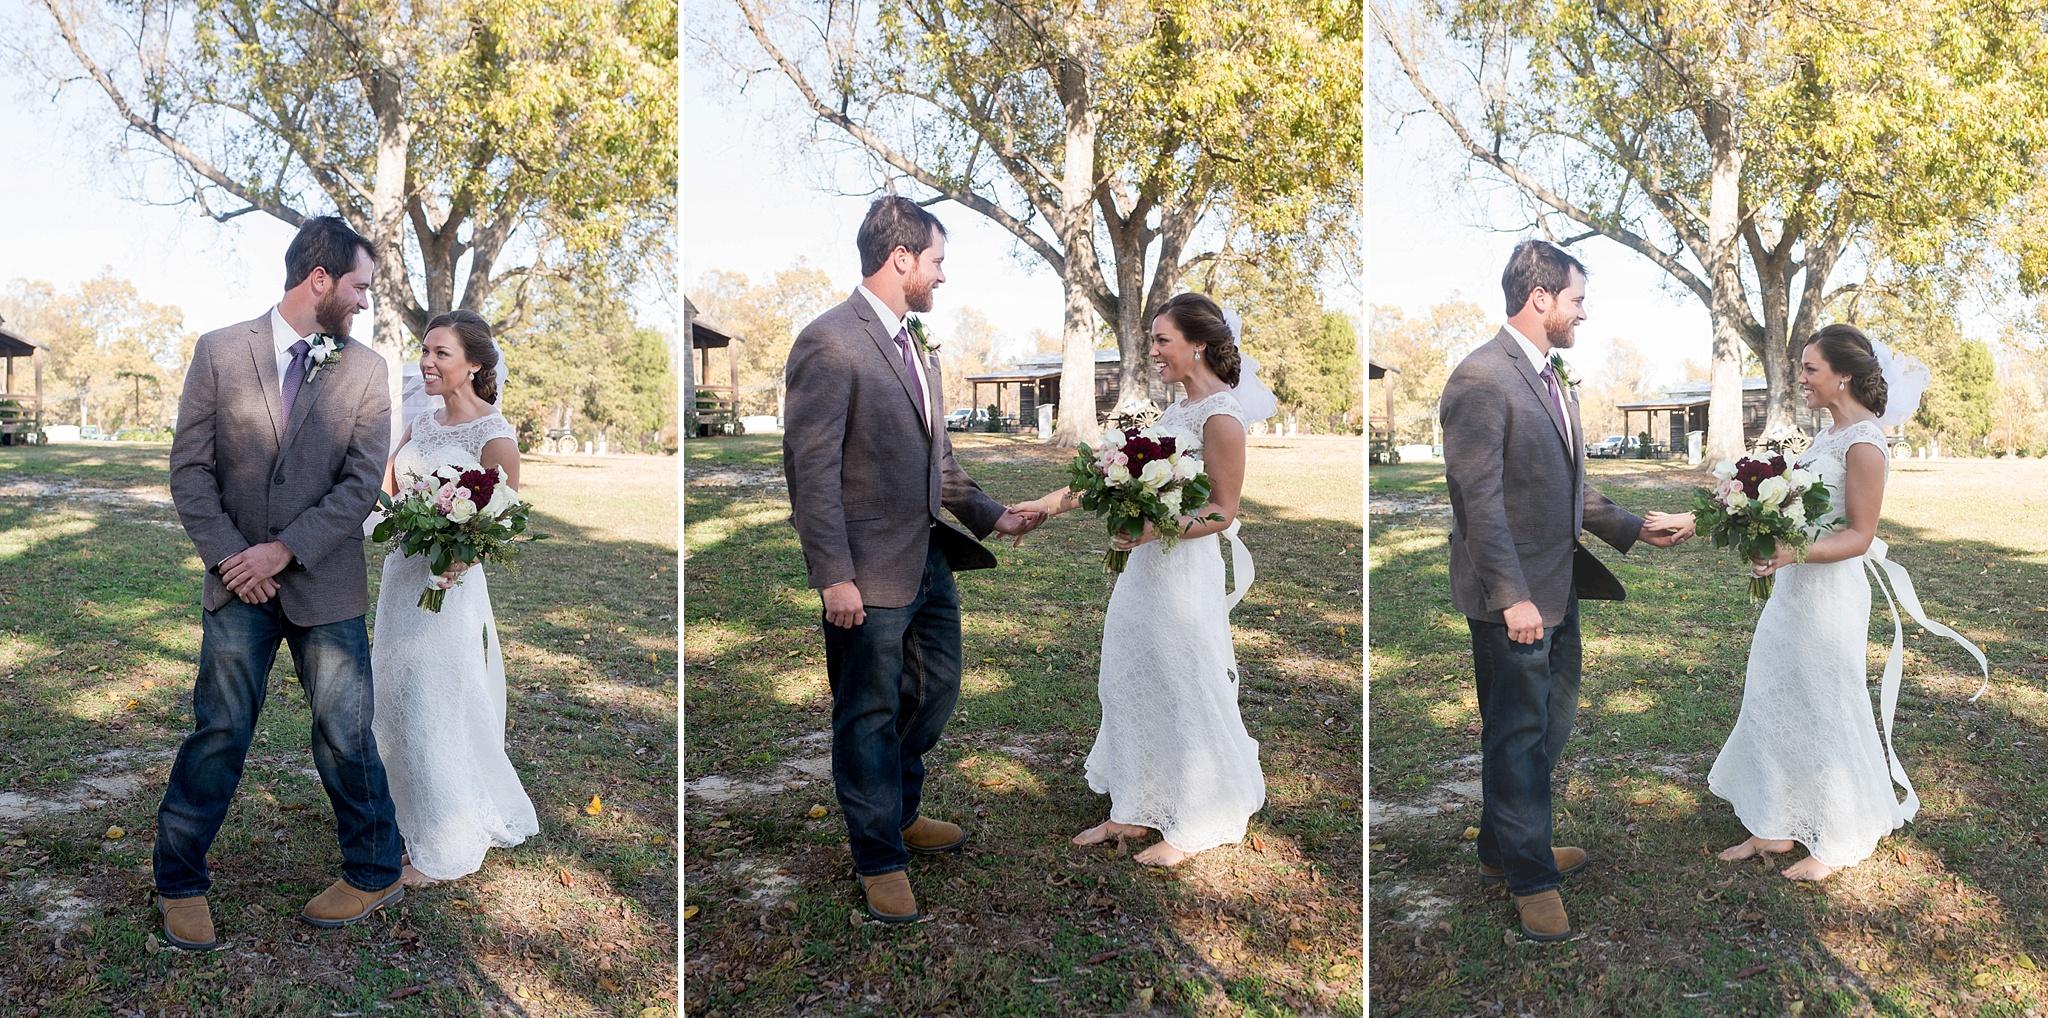 May-Lew-Farm-Farmville-NC-Wedding-Photographer-069.jpg